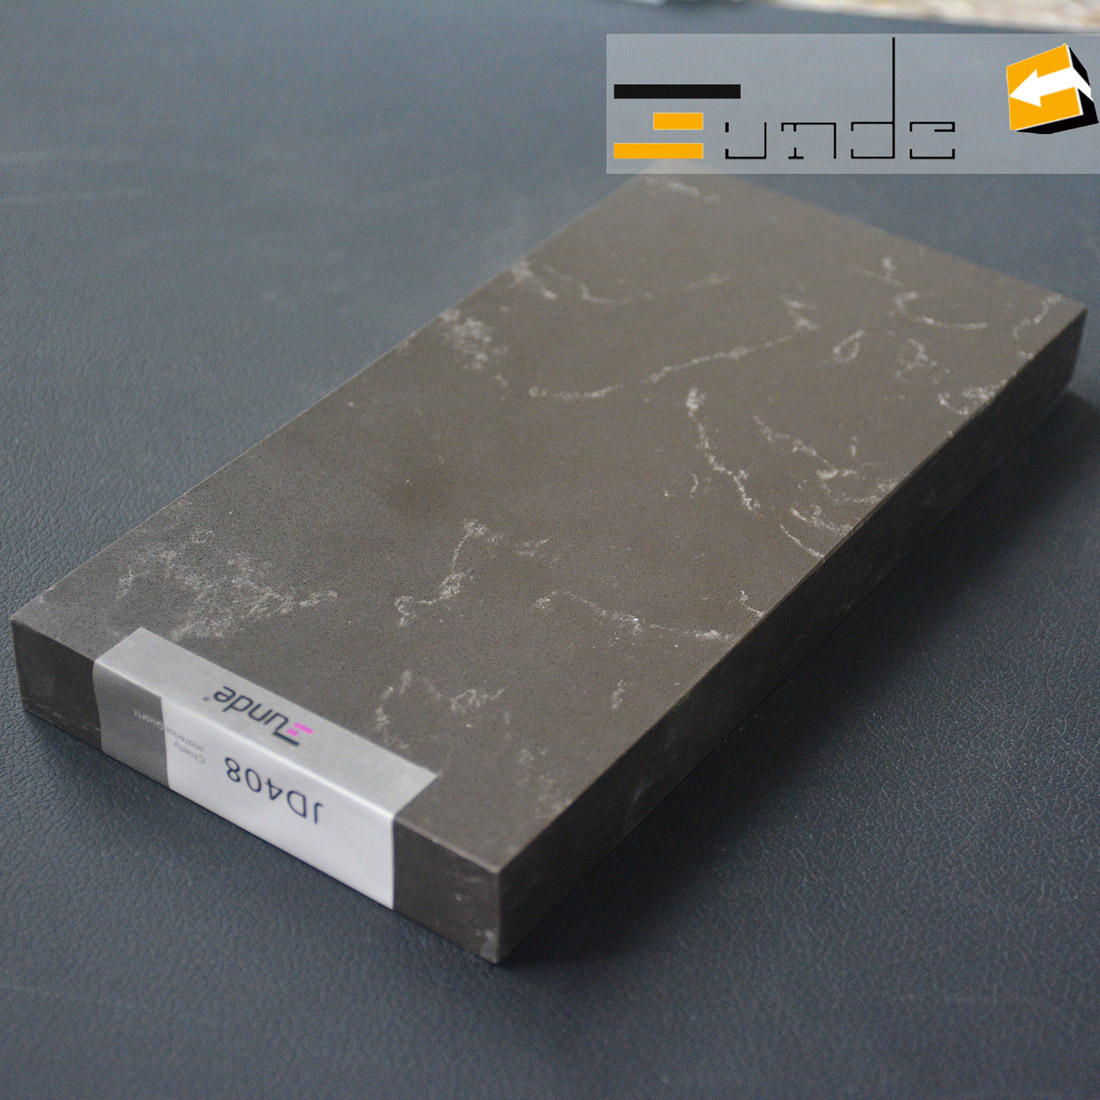 calacatta grey quartz stone sample jd408-3